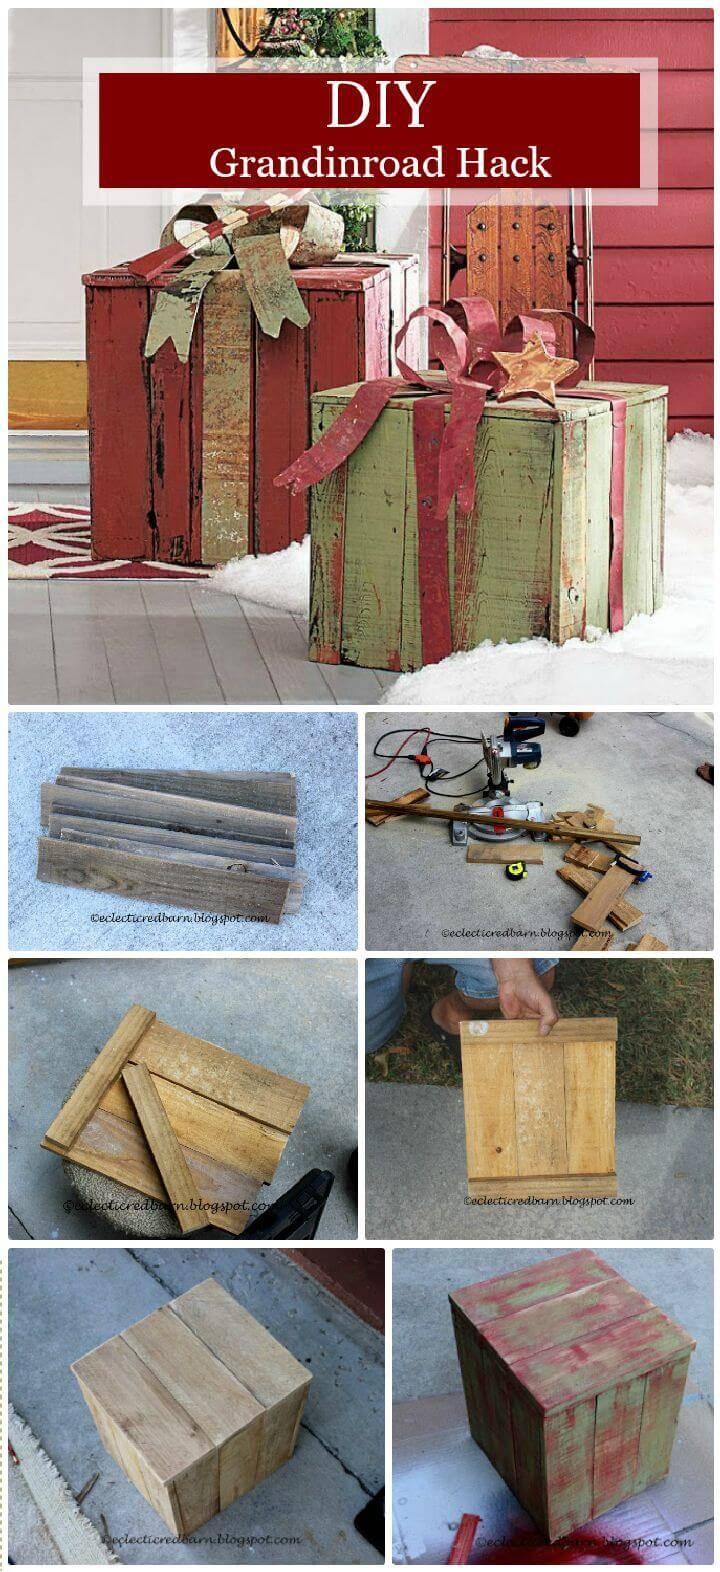 DIY Grandinroad Hack A Pallet Project